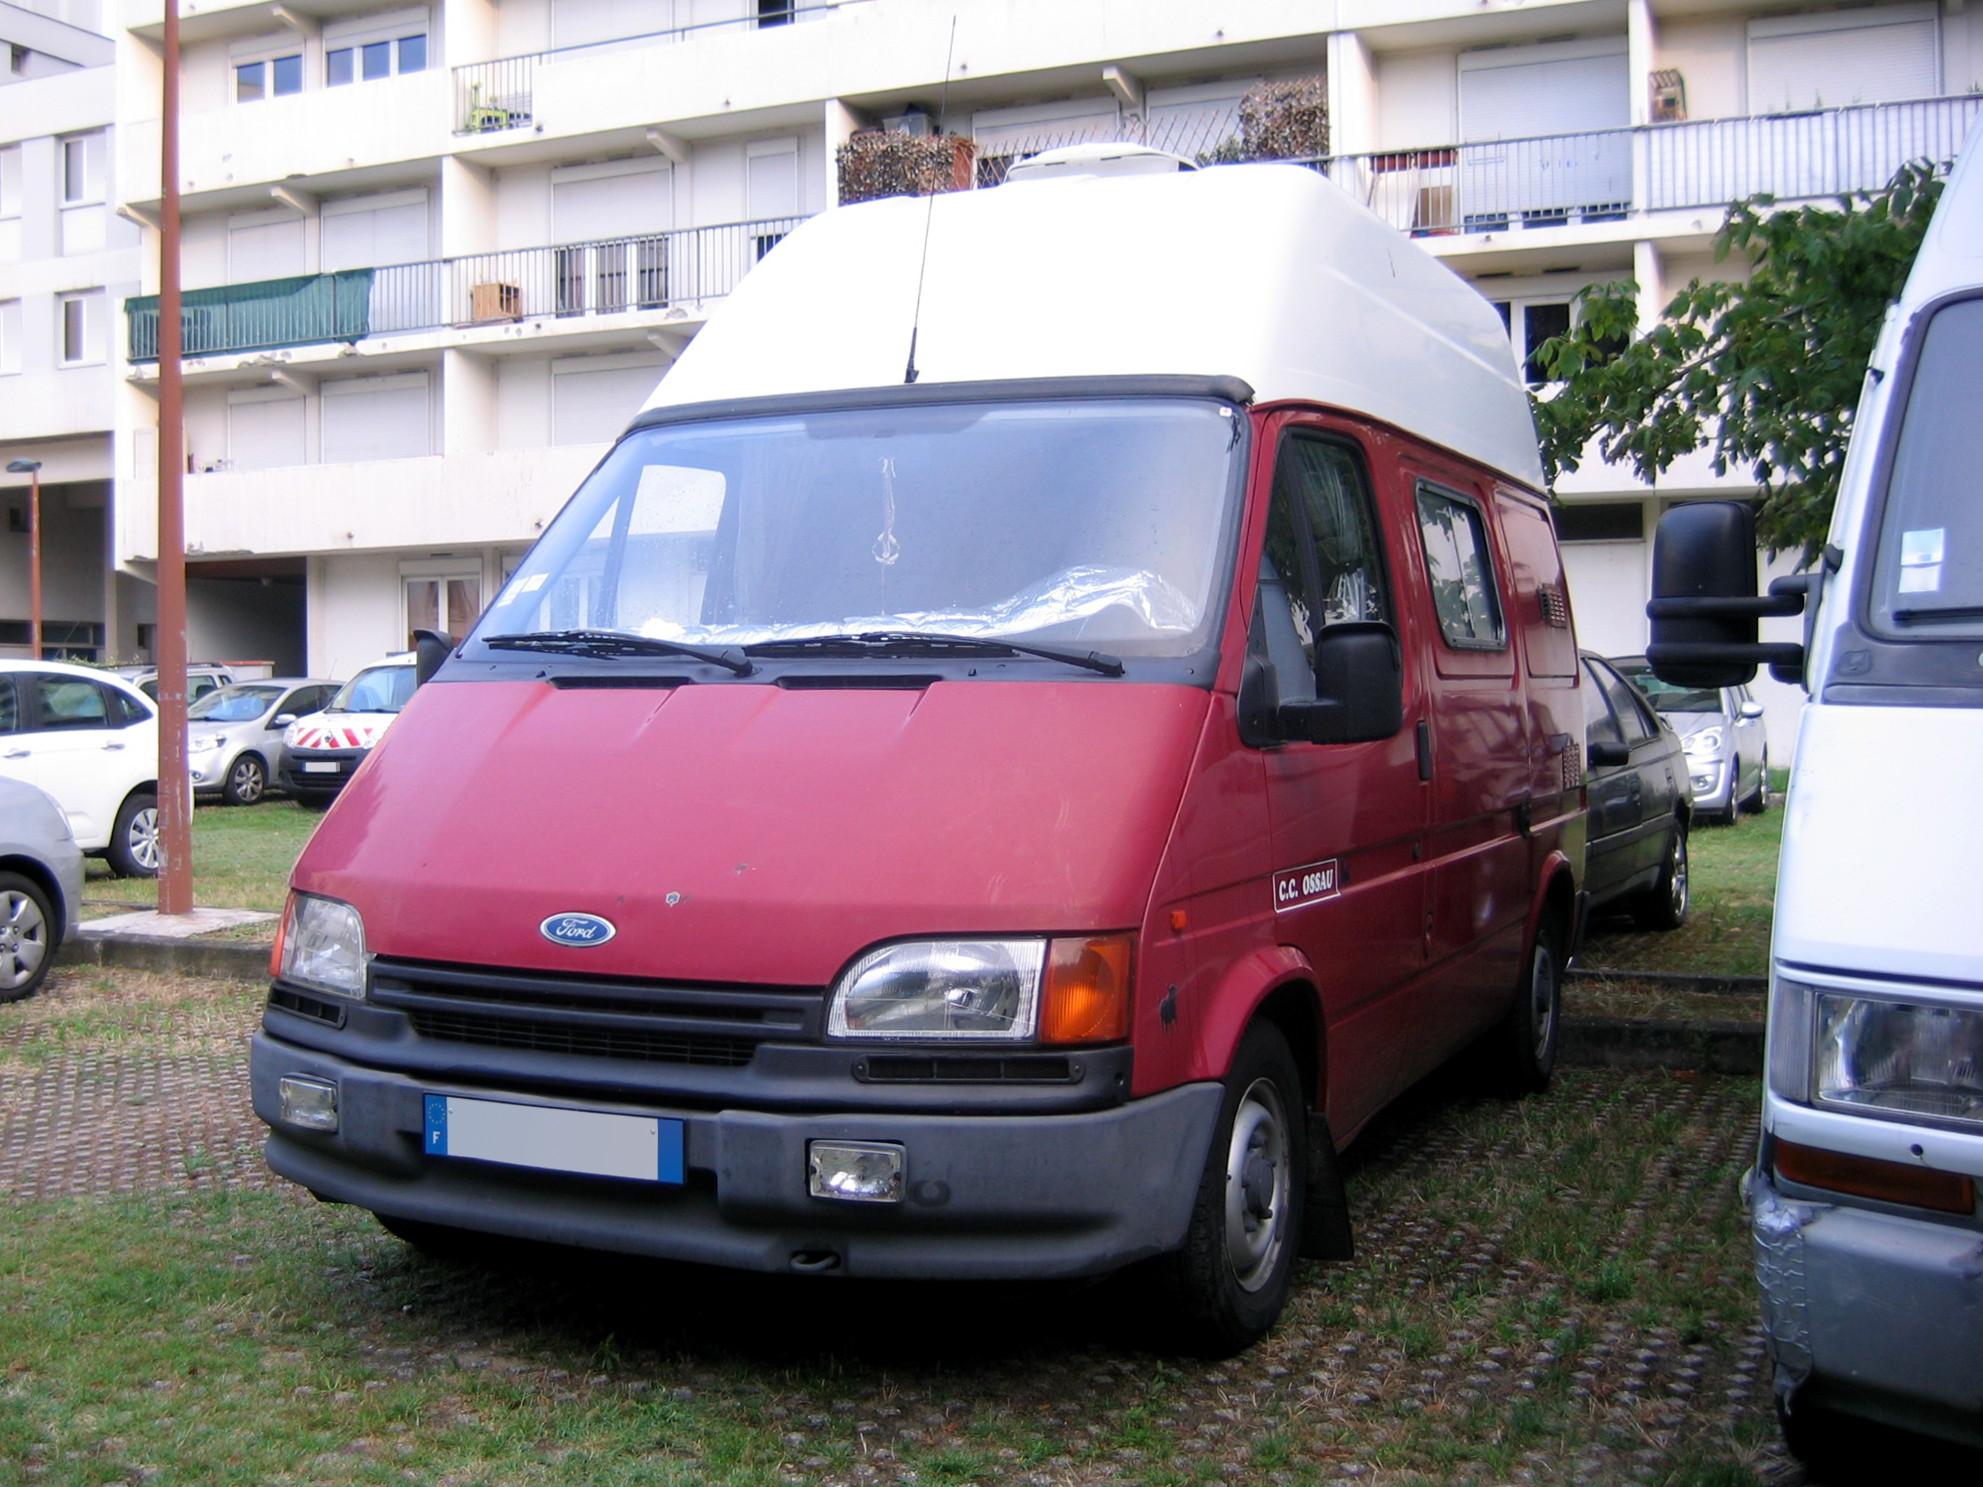 Ford Transit Van >> File:1991-1994 Ossau Ford Transit campervan (fl).jpg - Wikimedia Commons